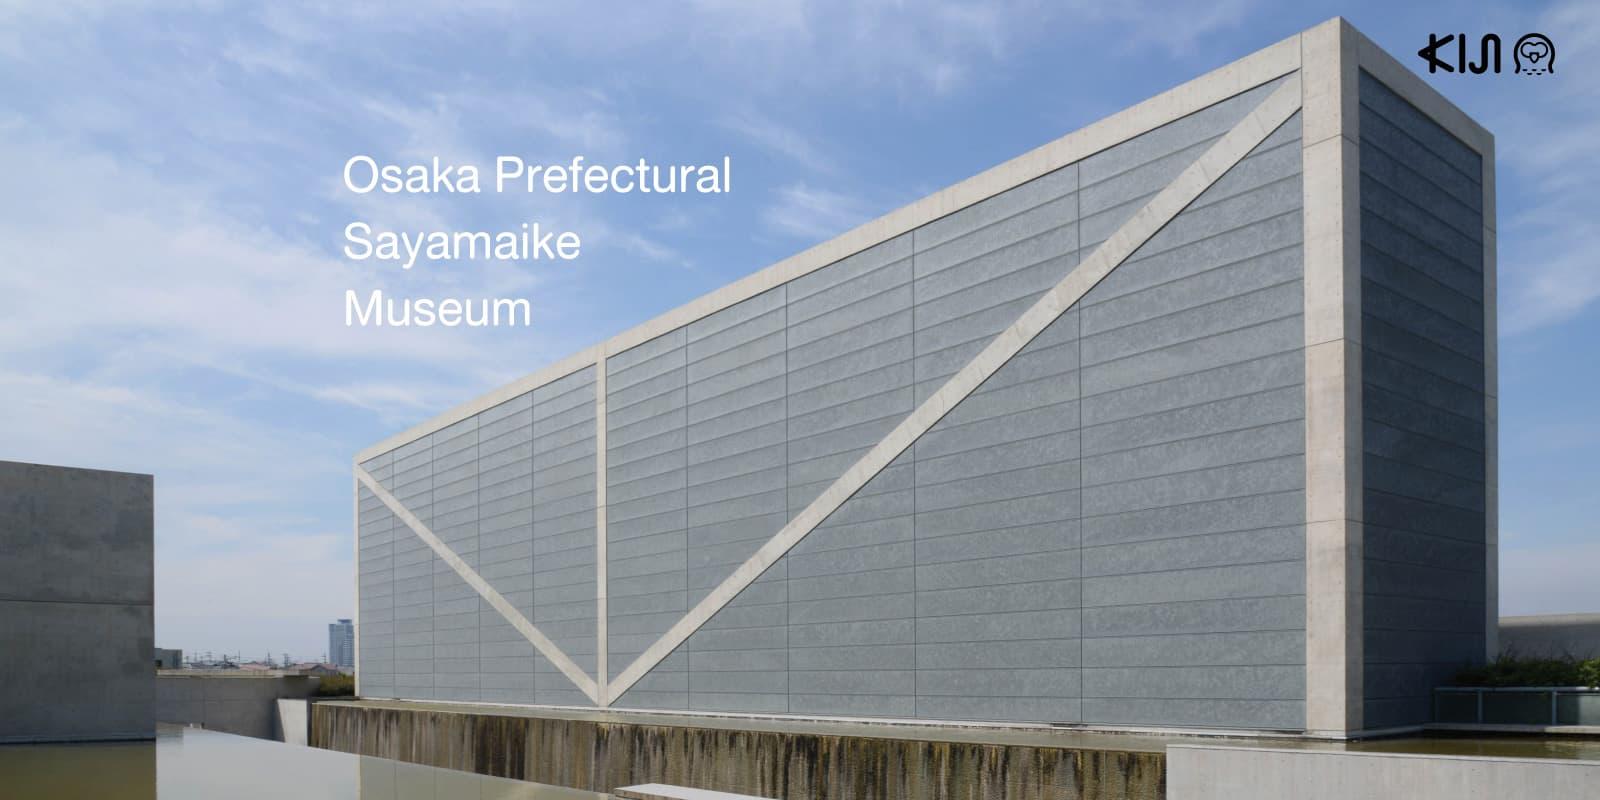 Osaka Prefectural Sayamaike Museum